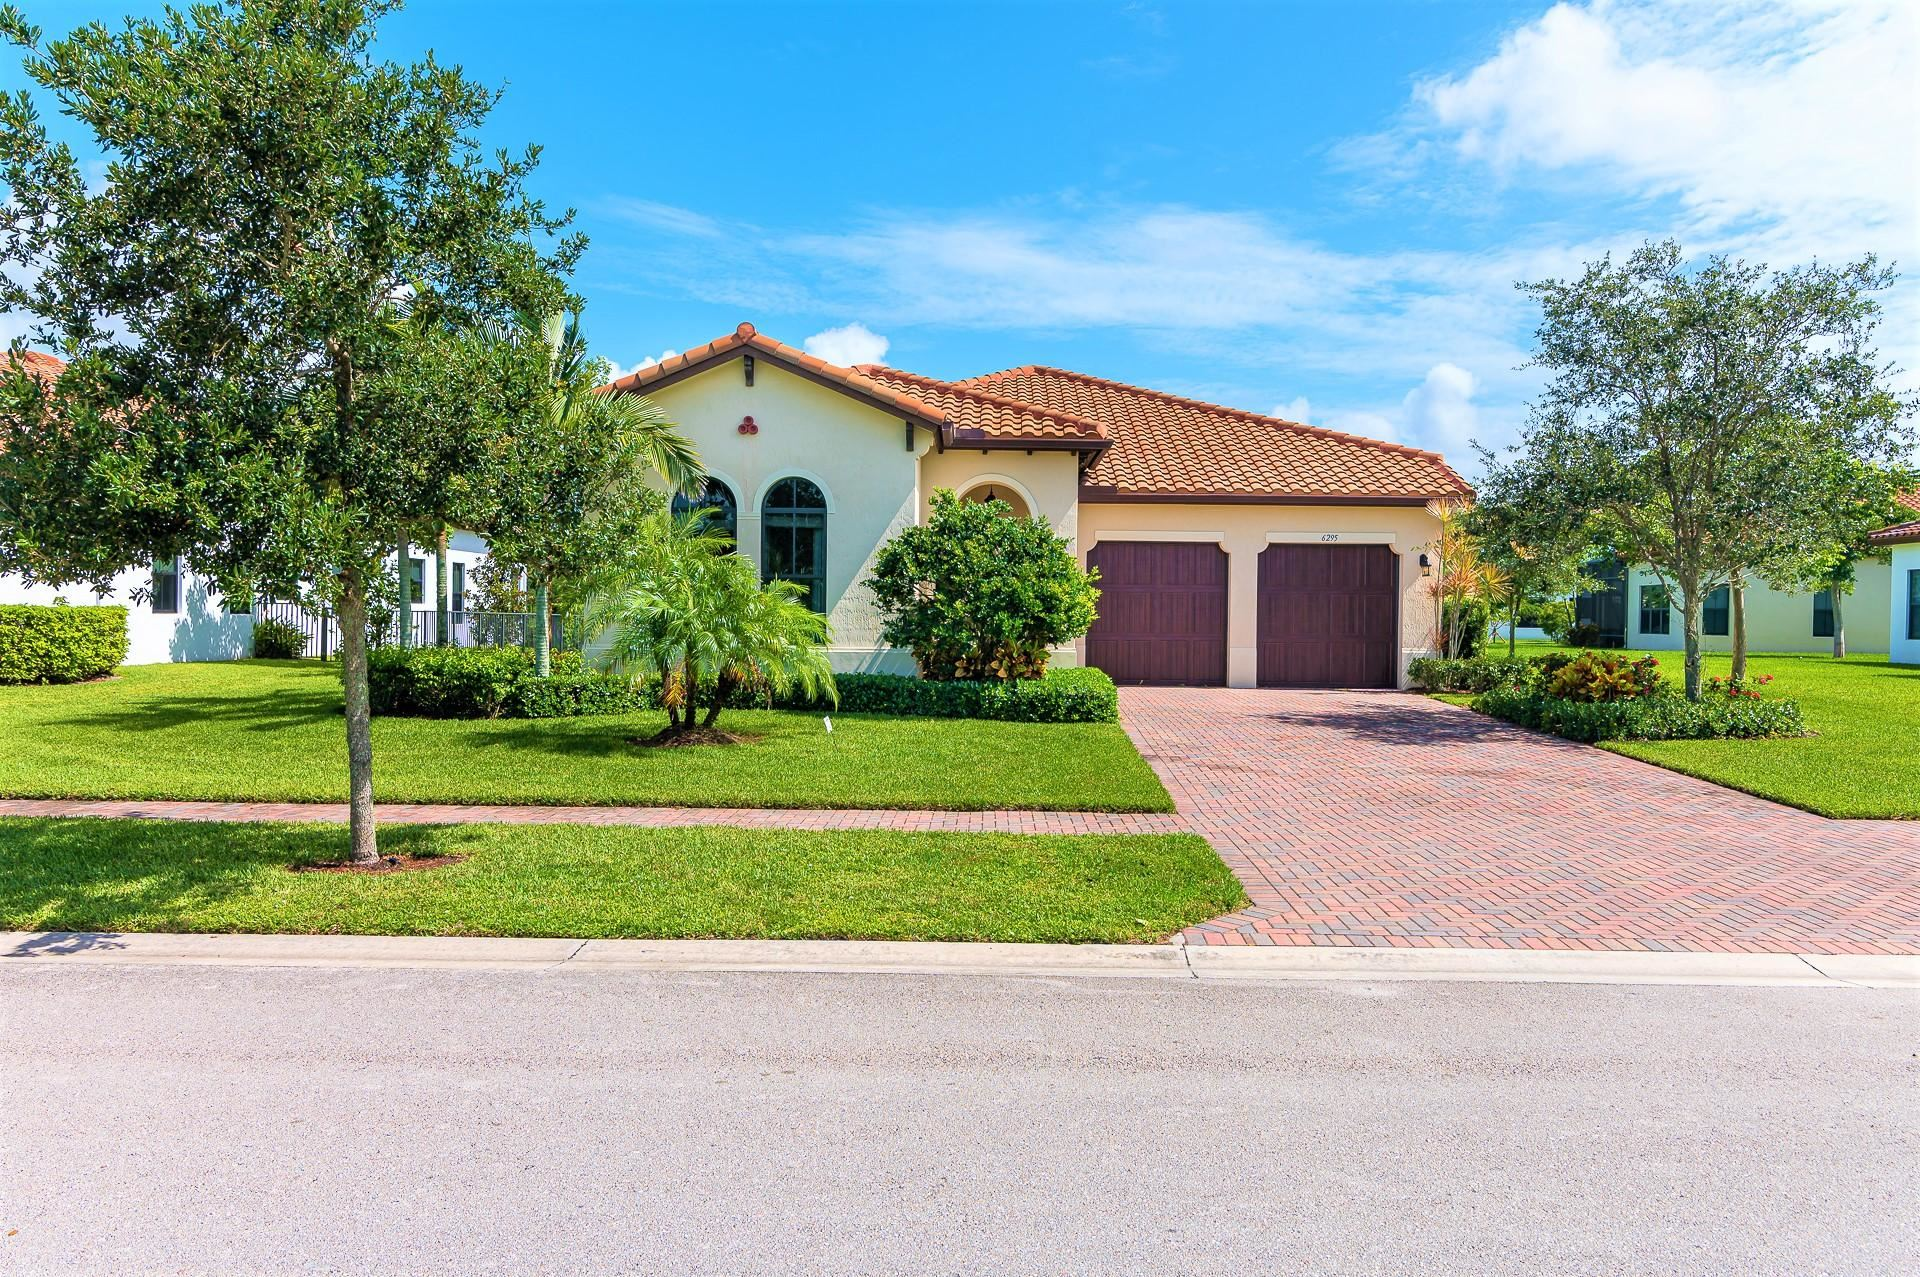 6295 Grebe Court, Lake Worth, FL 33463 - #: RX-10643100